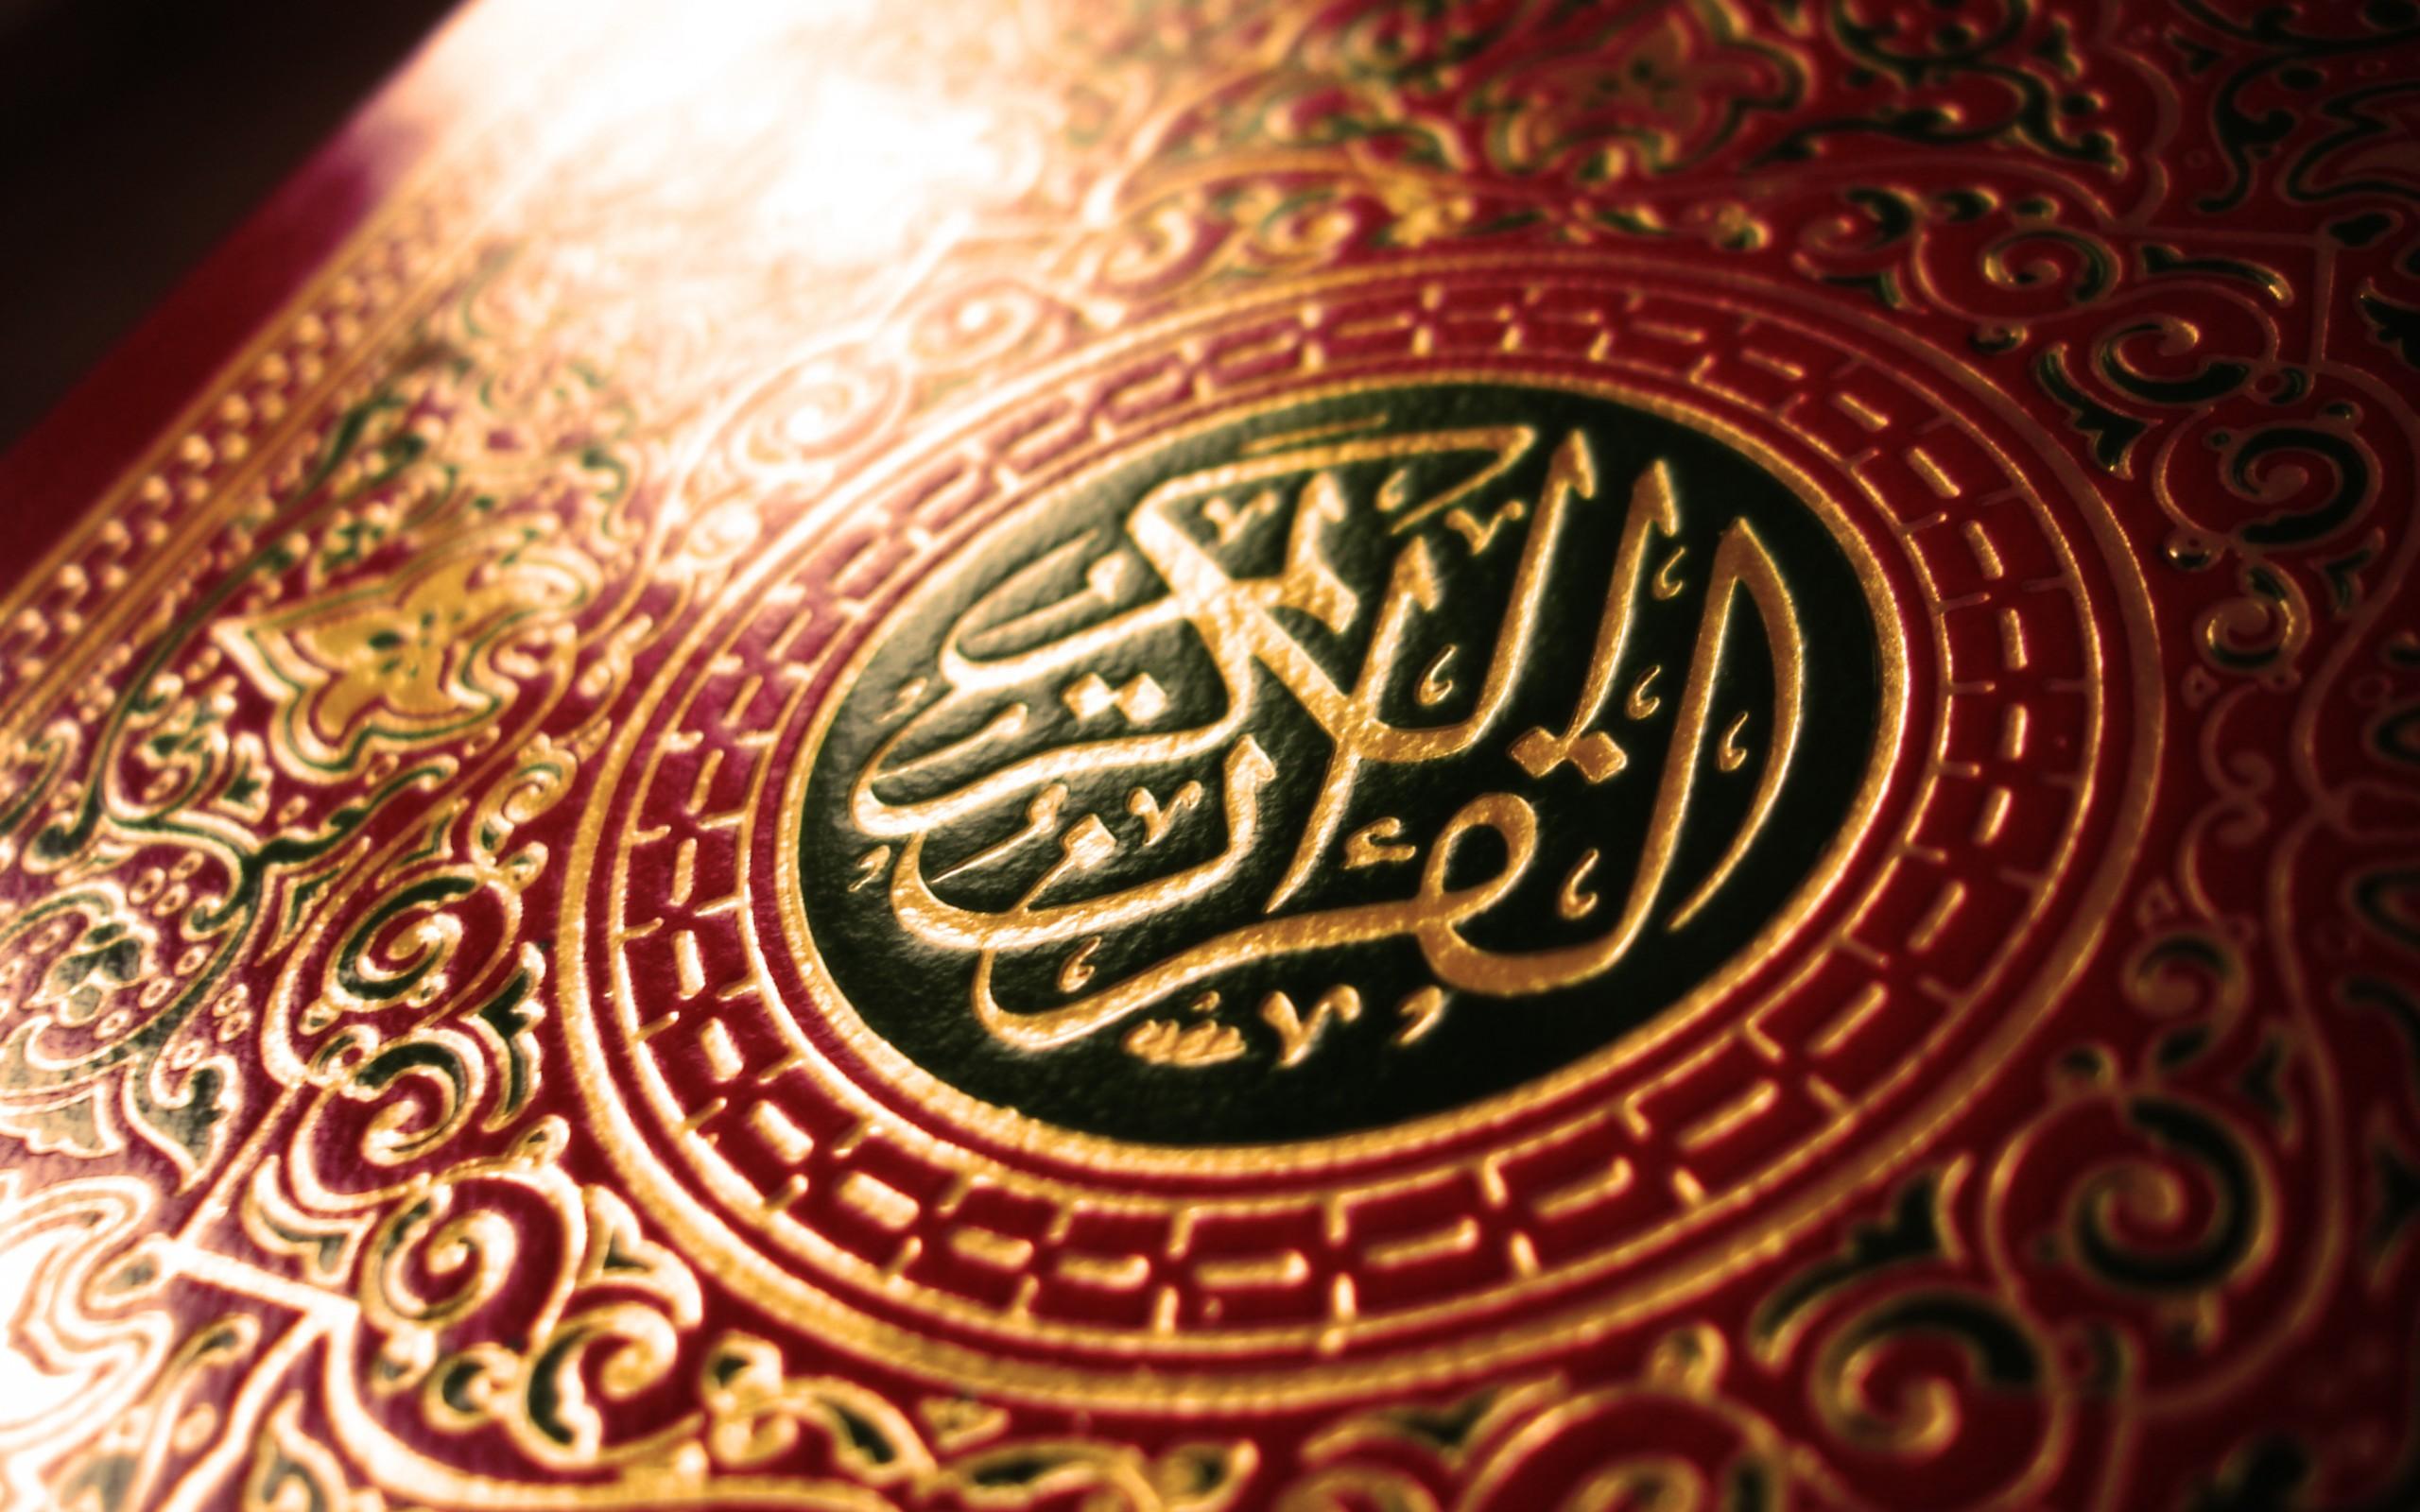 Wallpapers iphone quran - Quran Cover